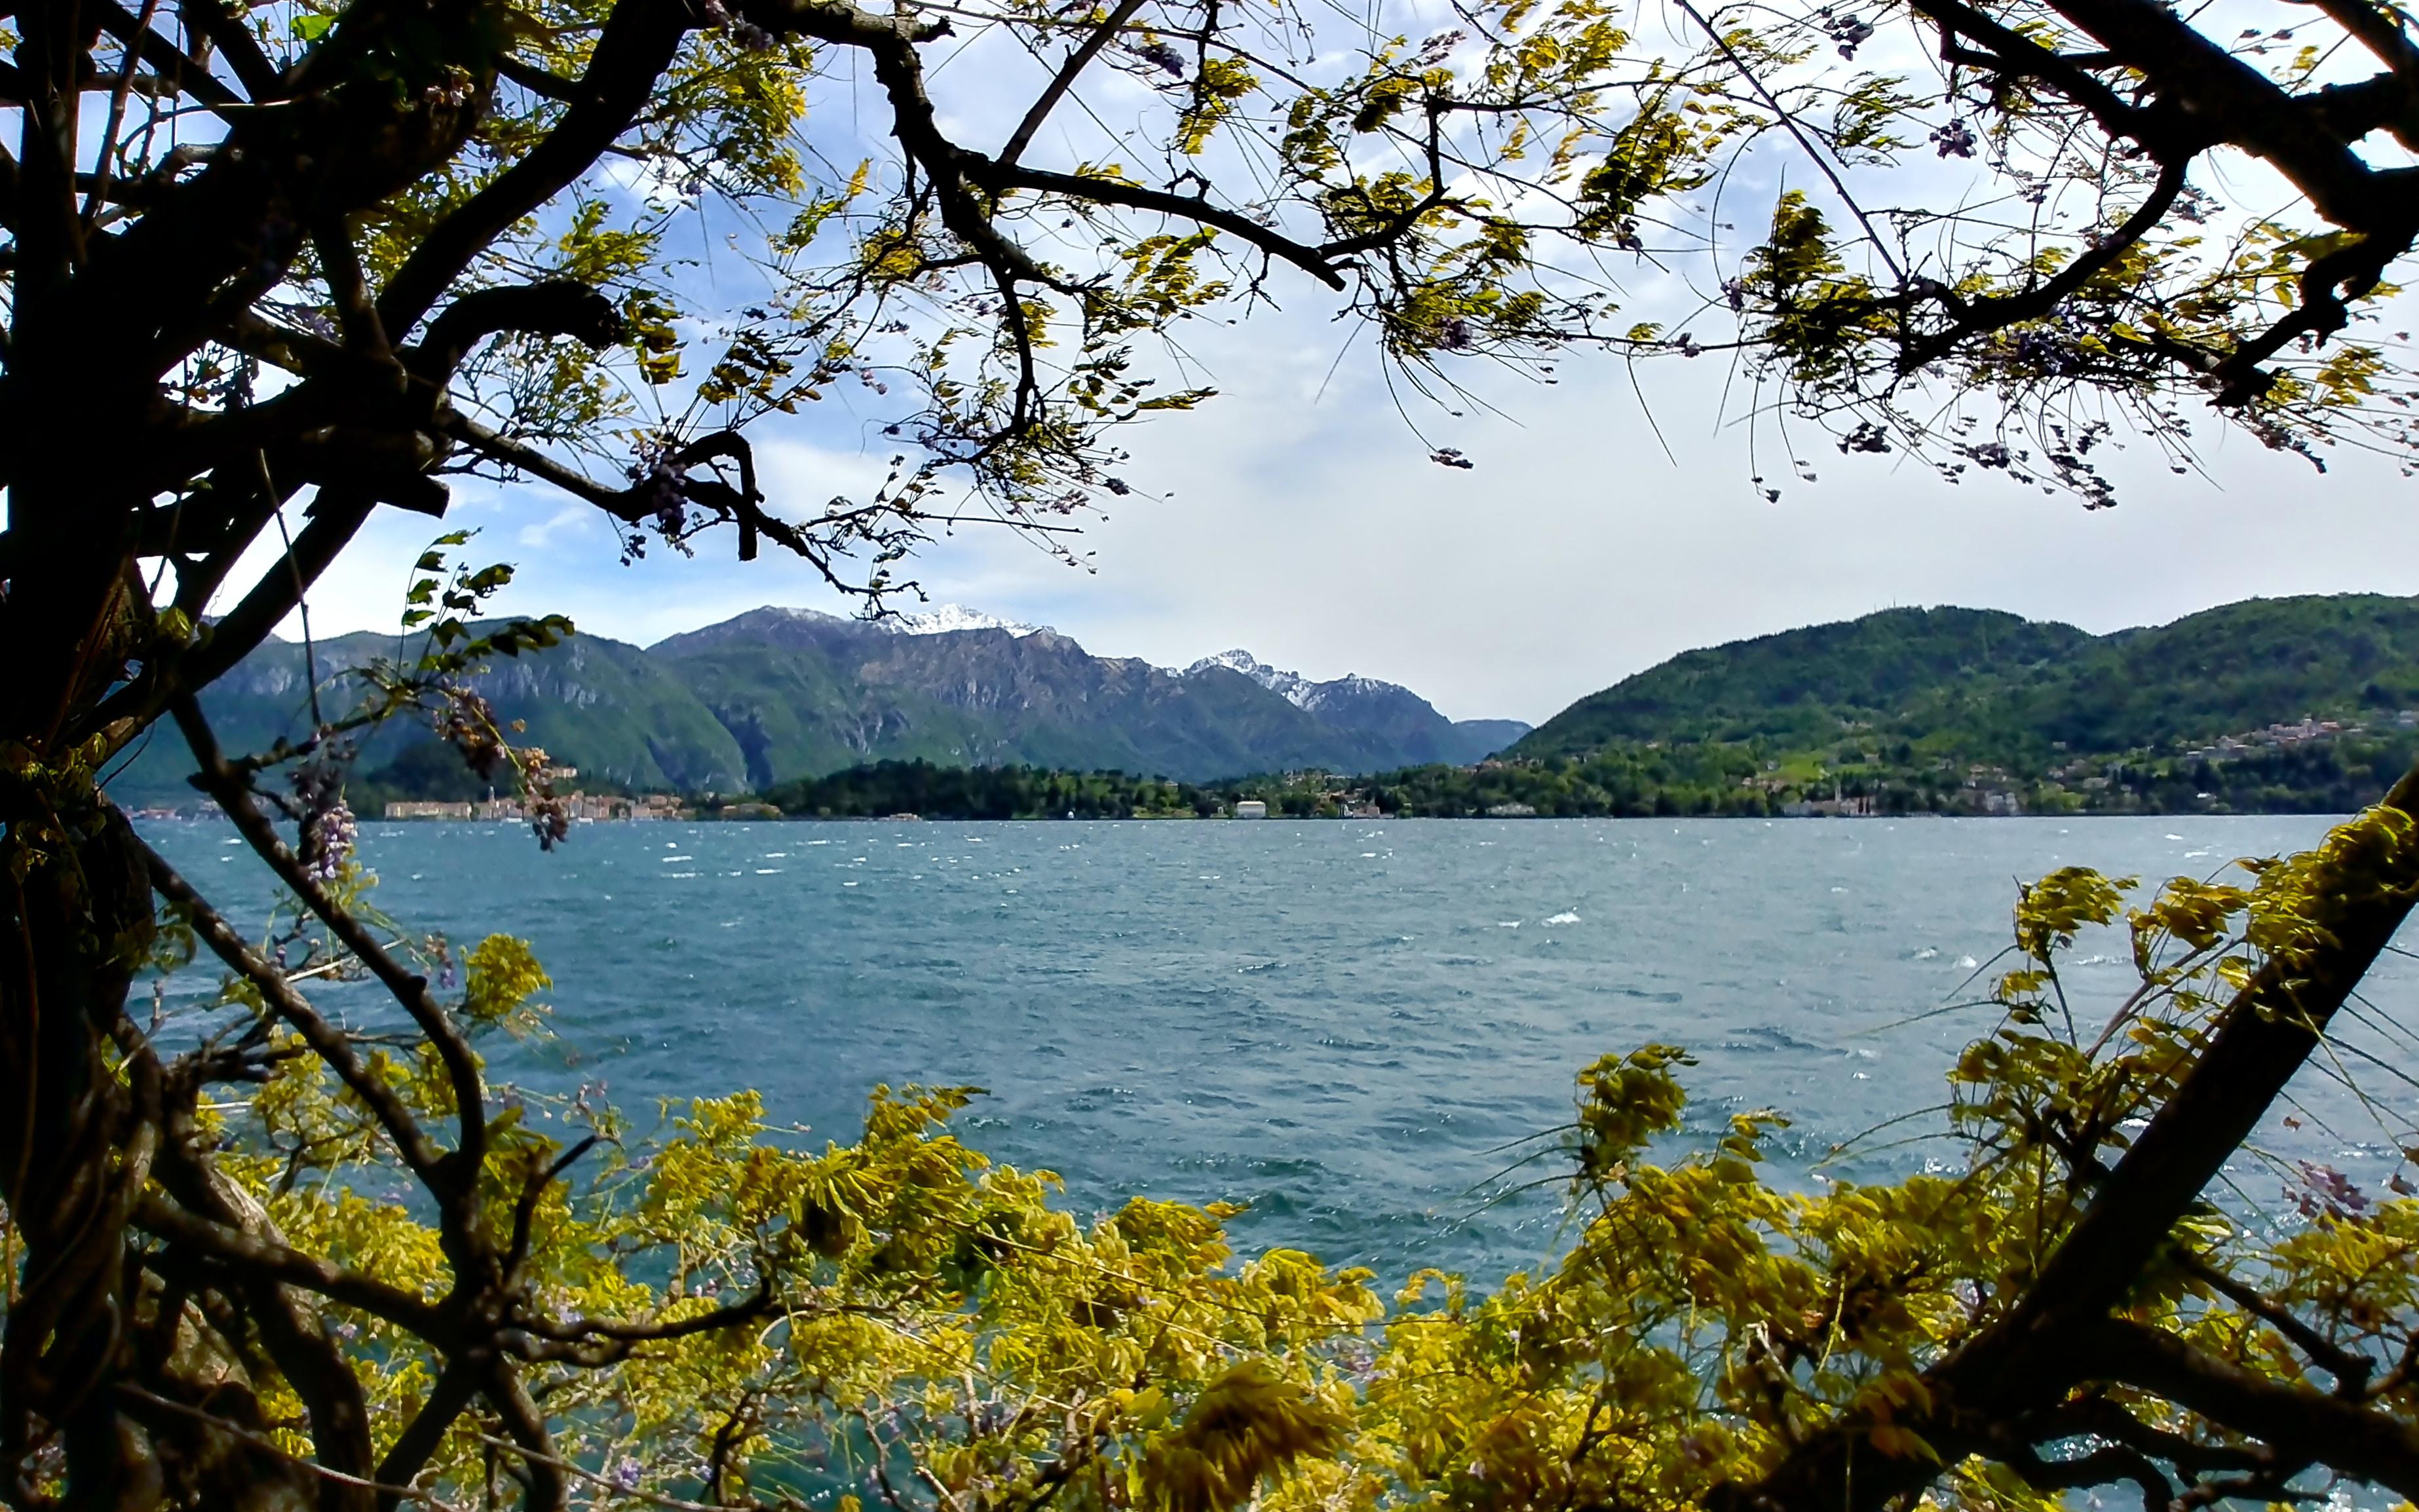 Lake view through some vegetation